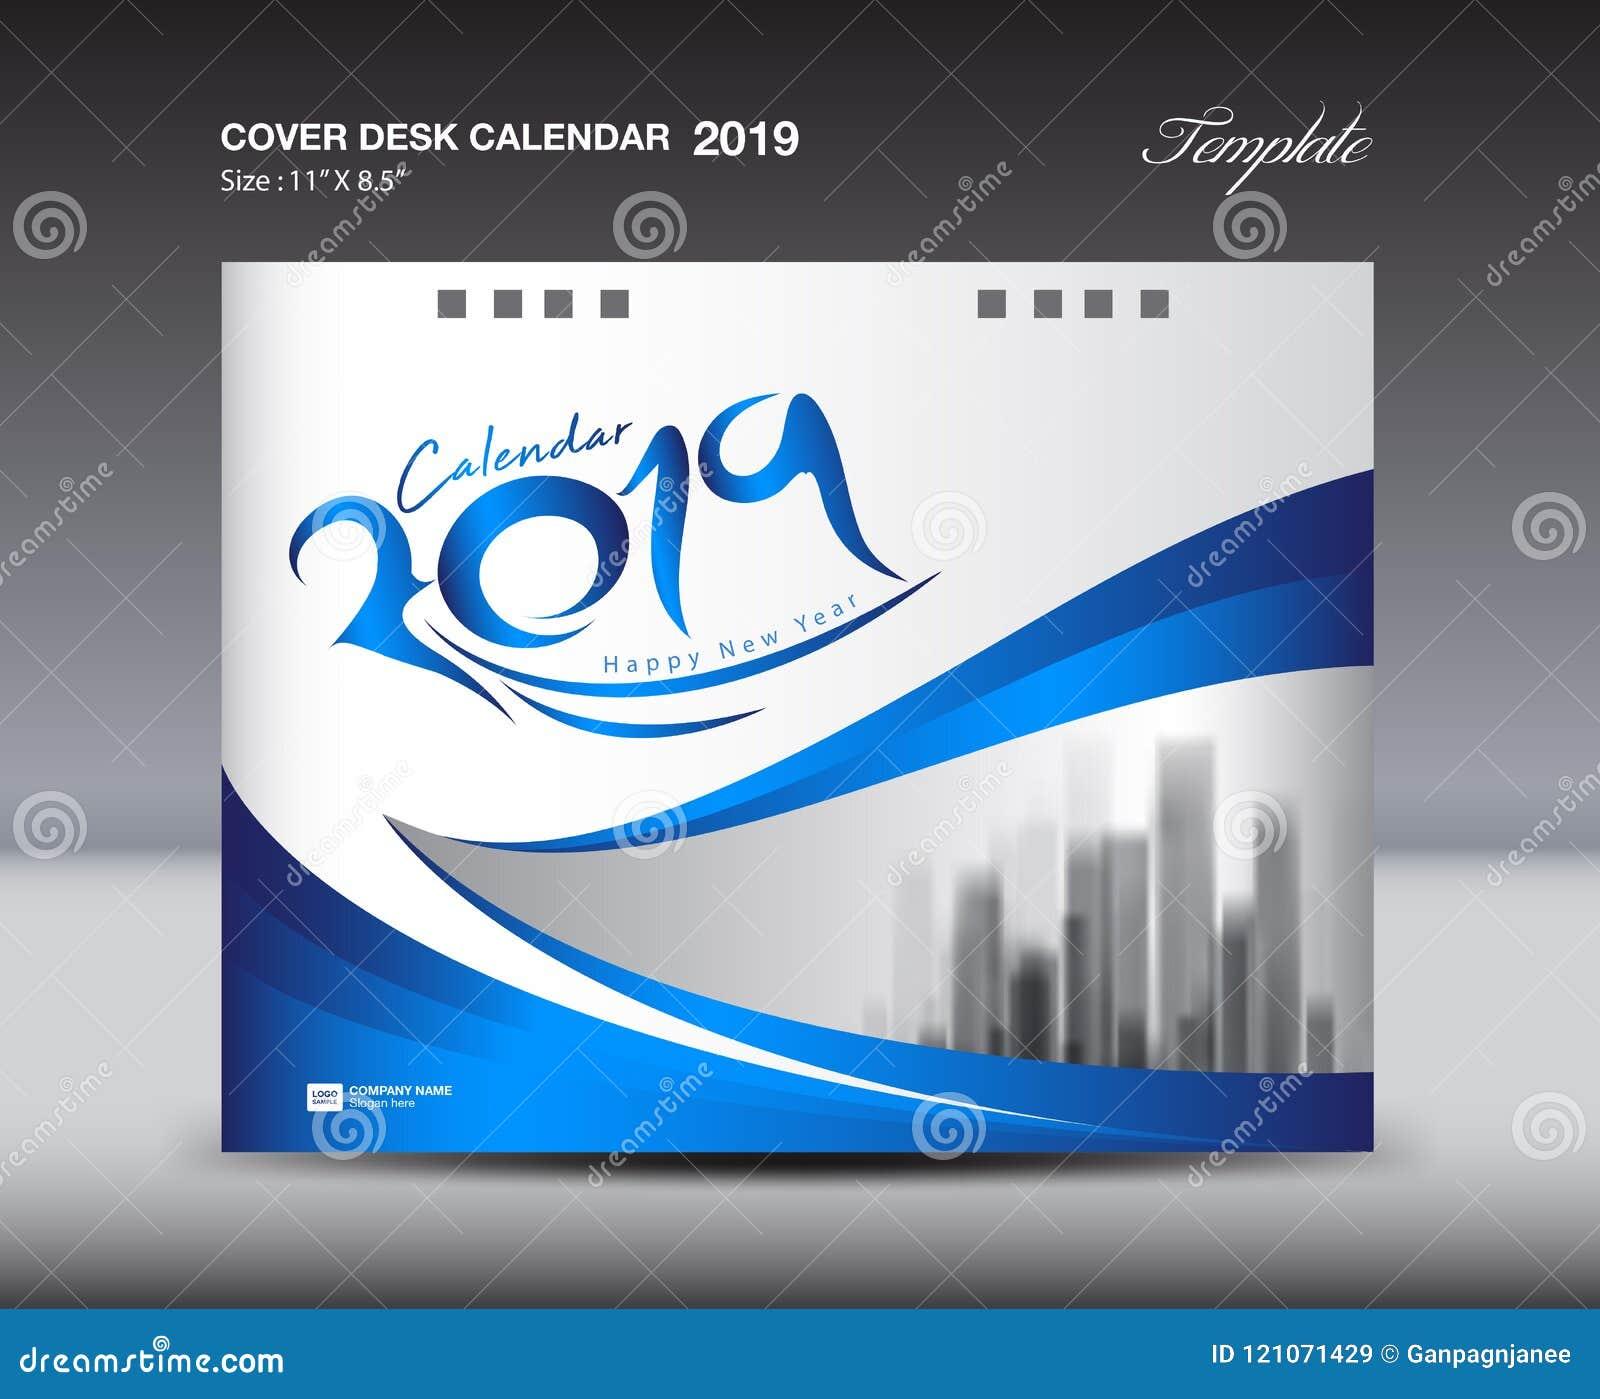 blue cover desk calendar 2019 design template flyer template ads